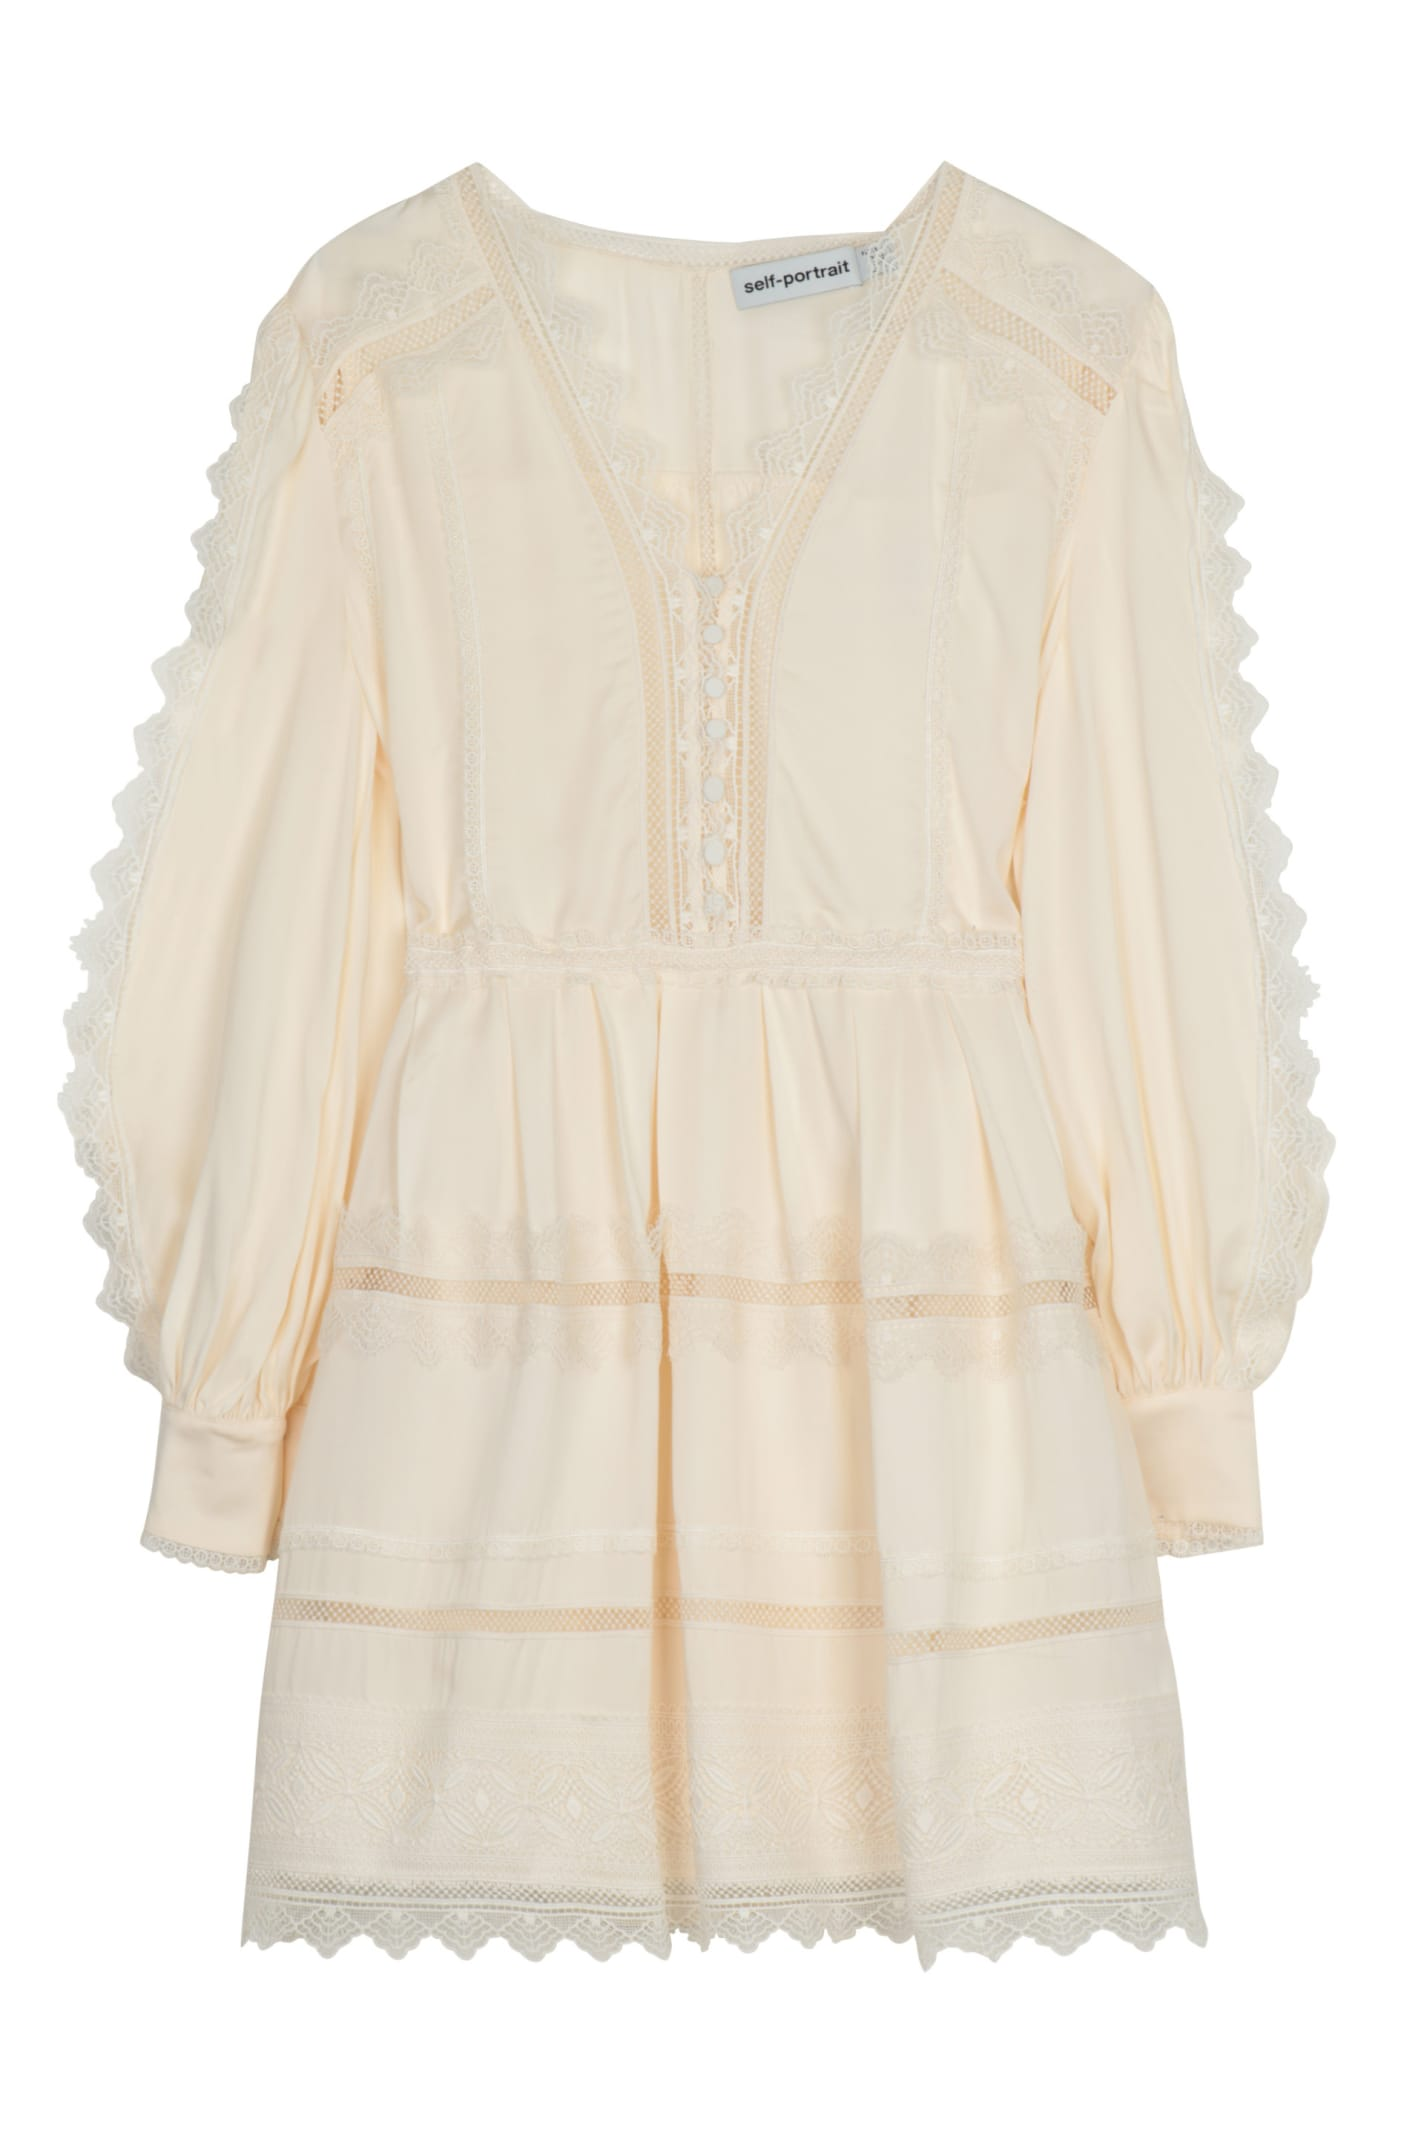 Buy self-portrait Lace Trim Mini Dress online, shop self-portrait with free shipping